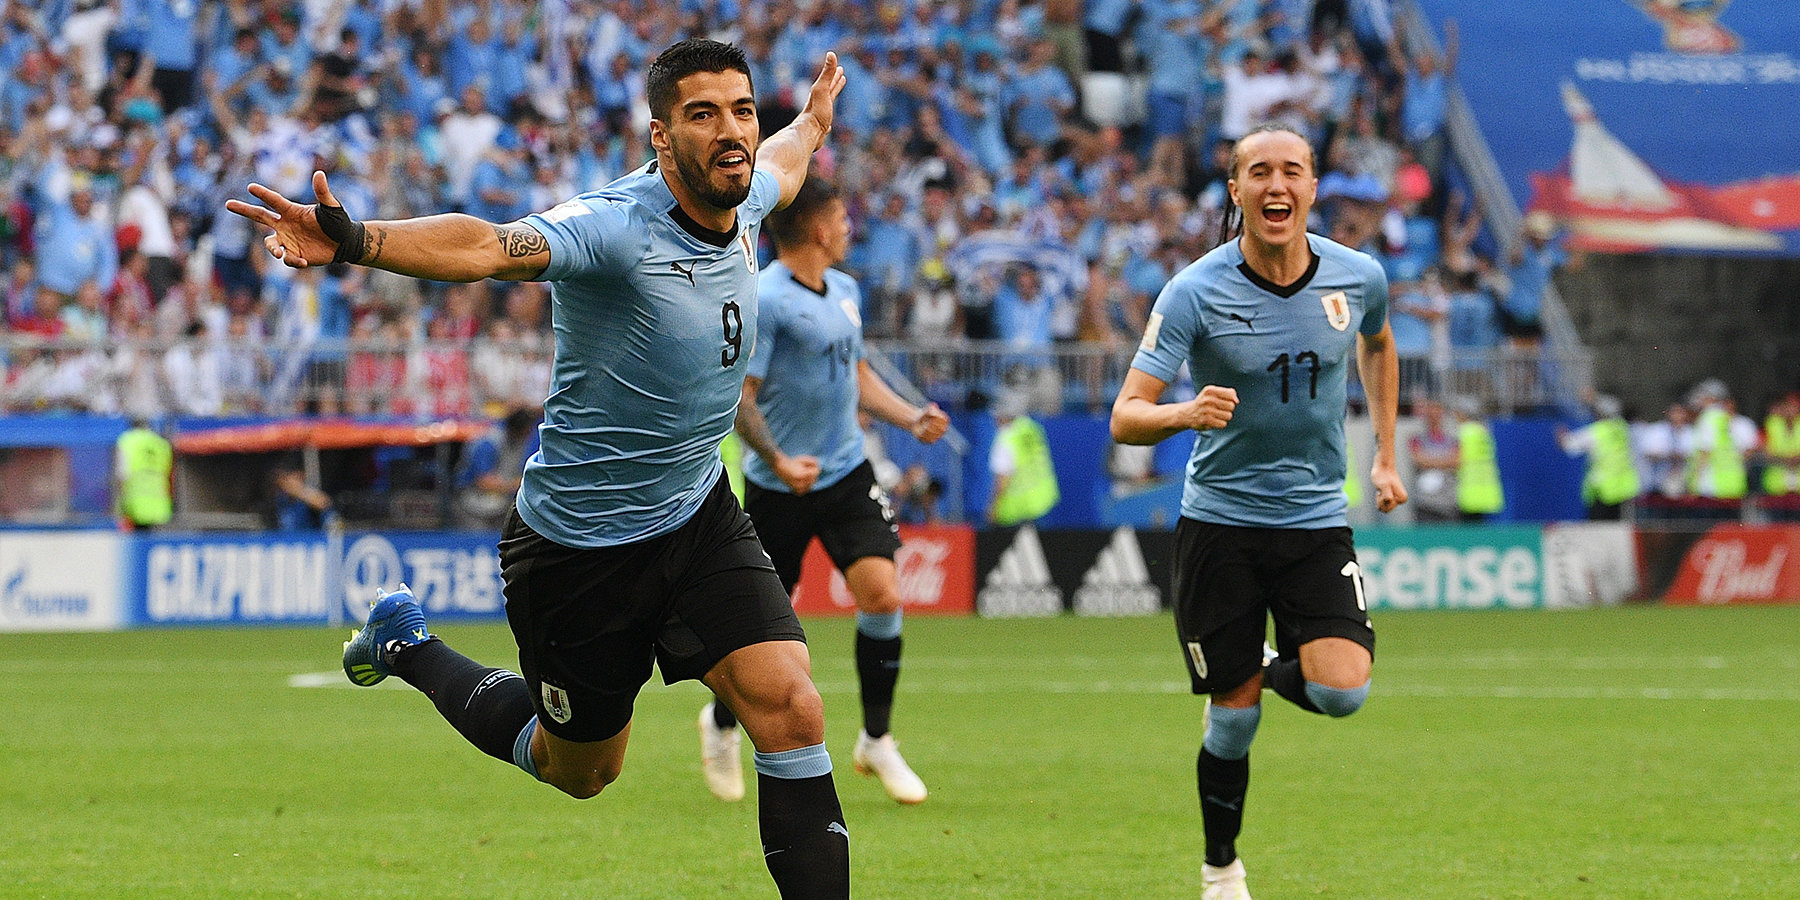 Уругвай англия счет футбола 19. 06. 14